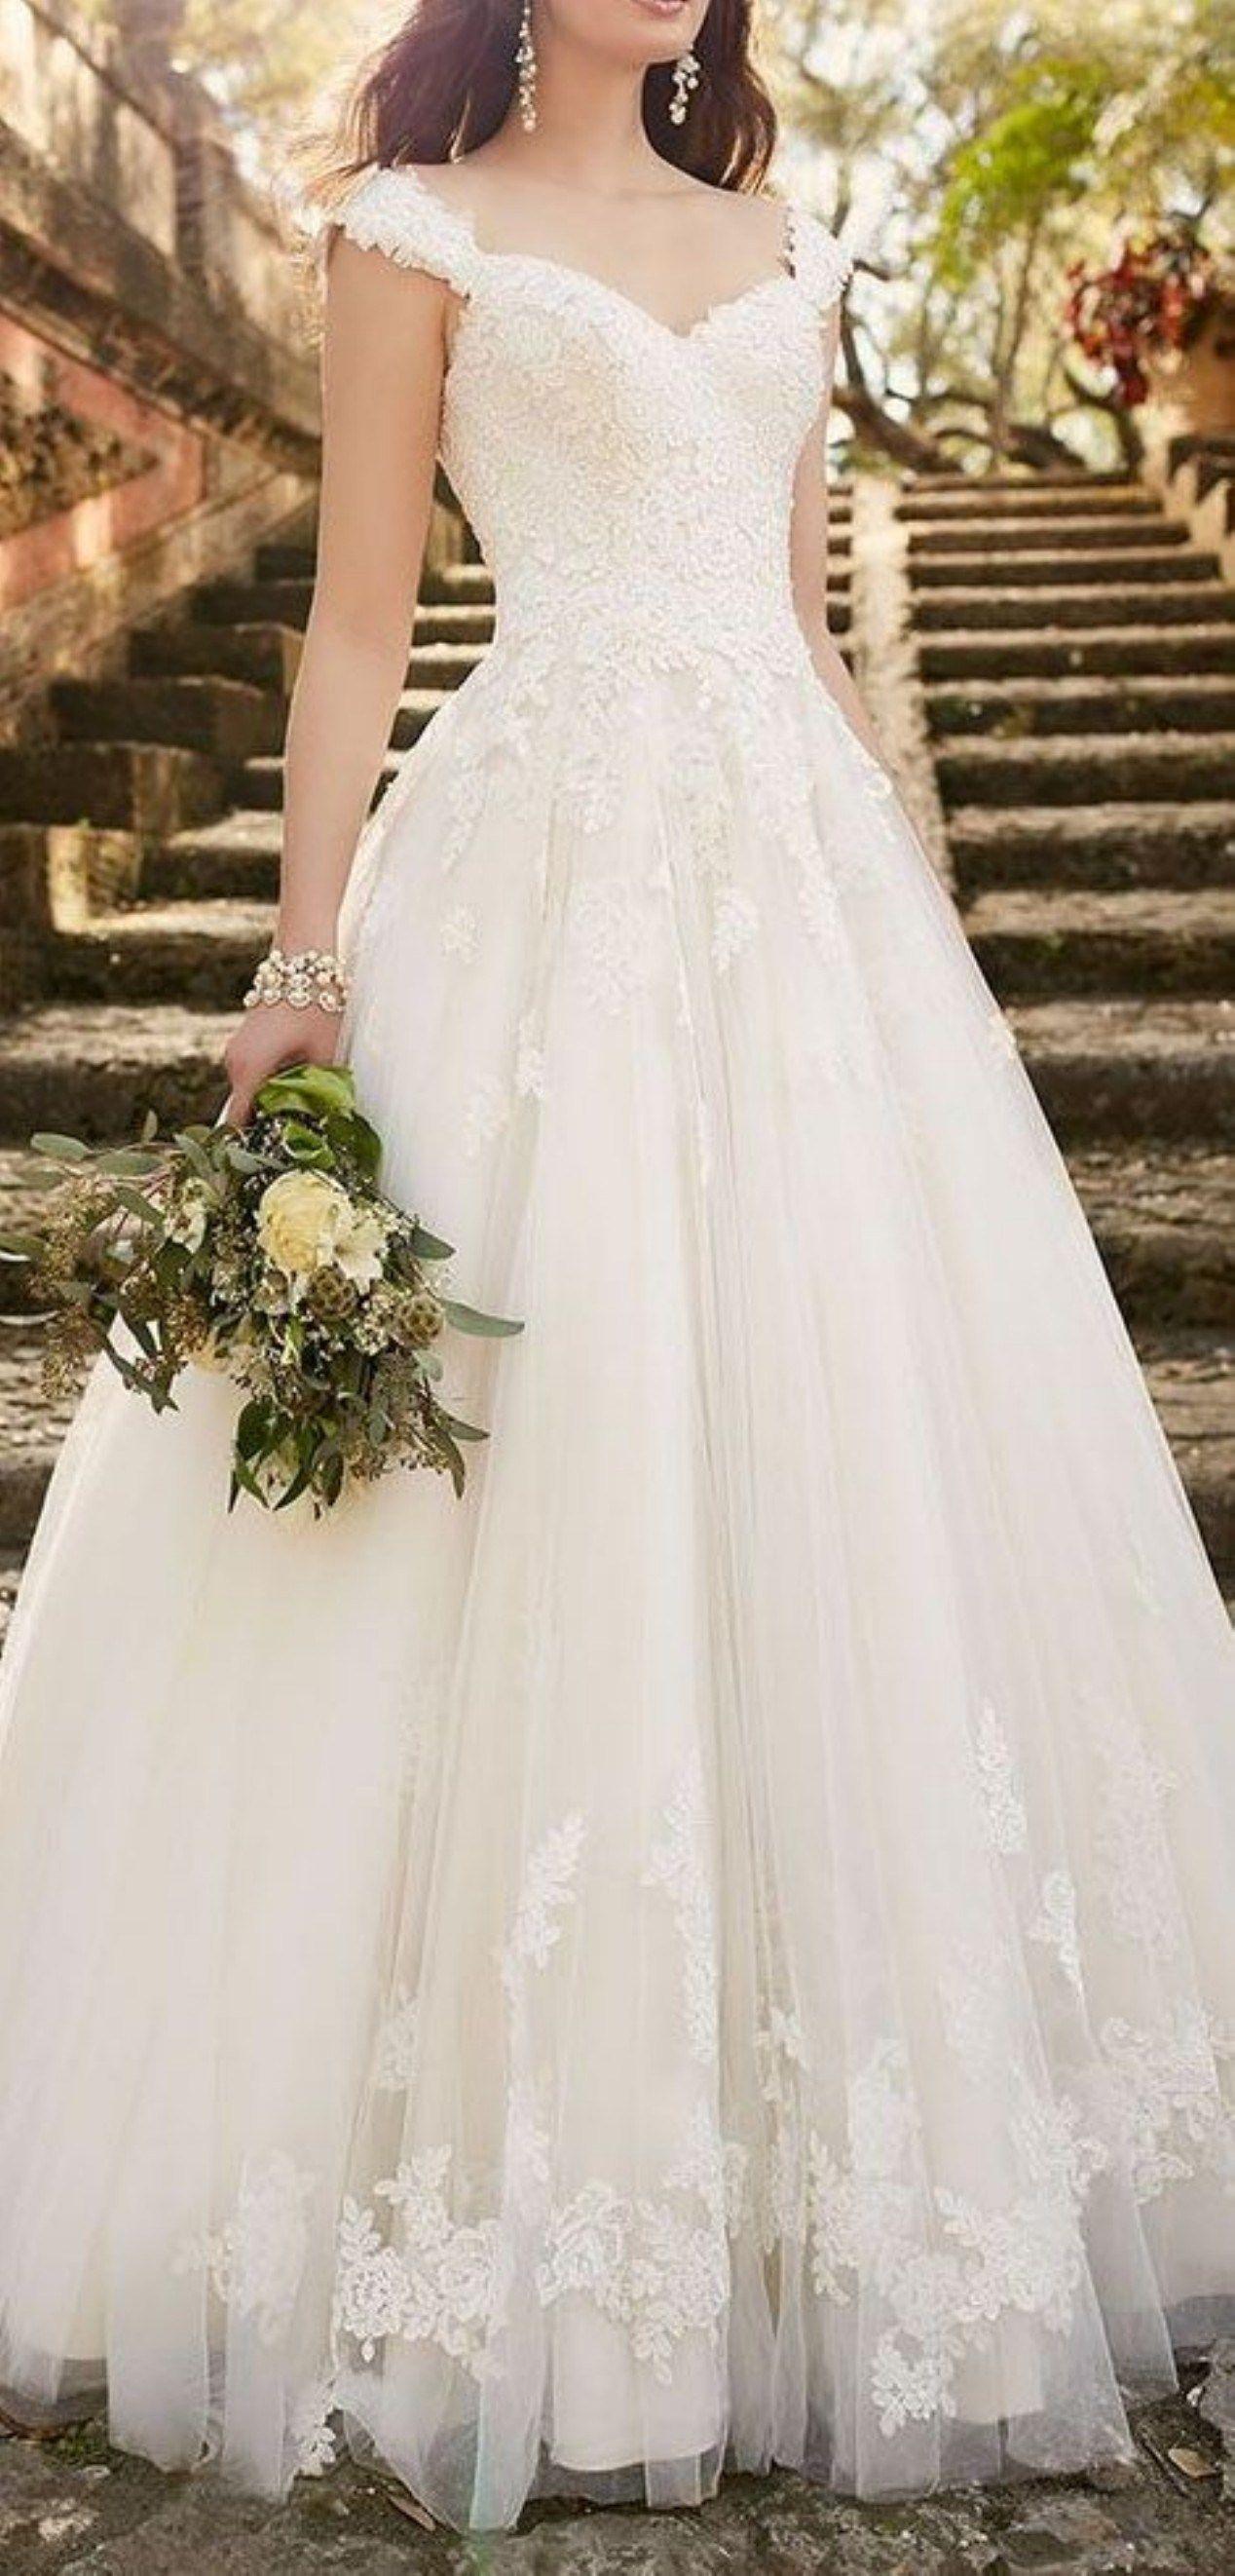 Breathtaking disney princess wedding dress to fullfill your wedding ...